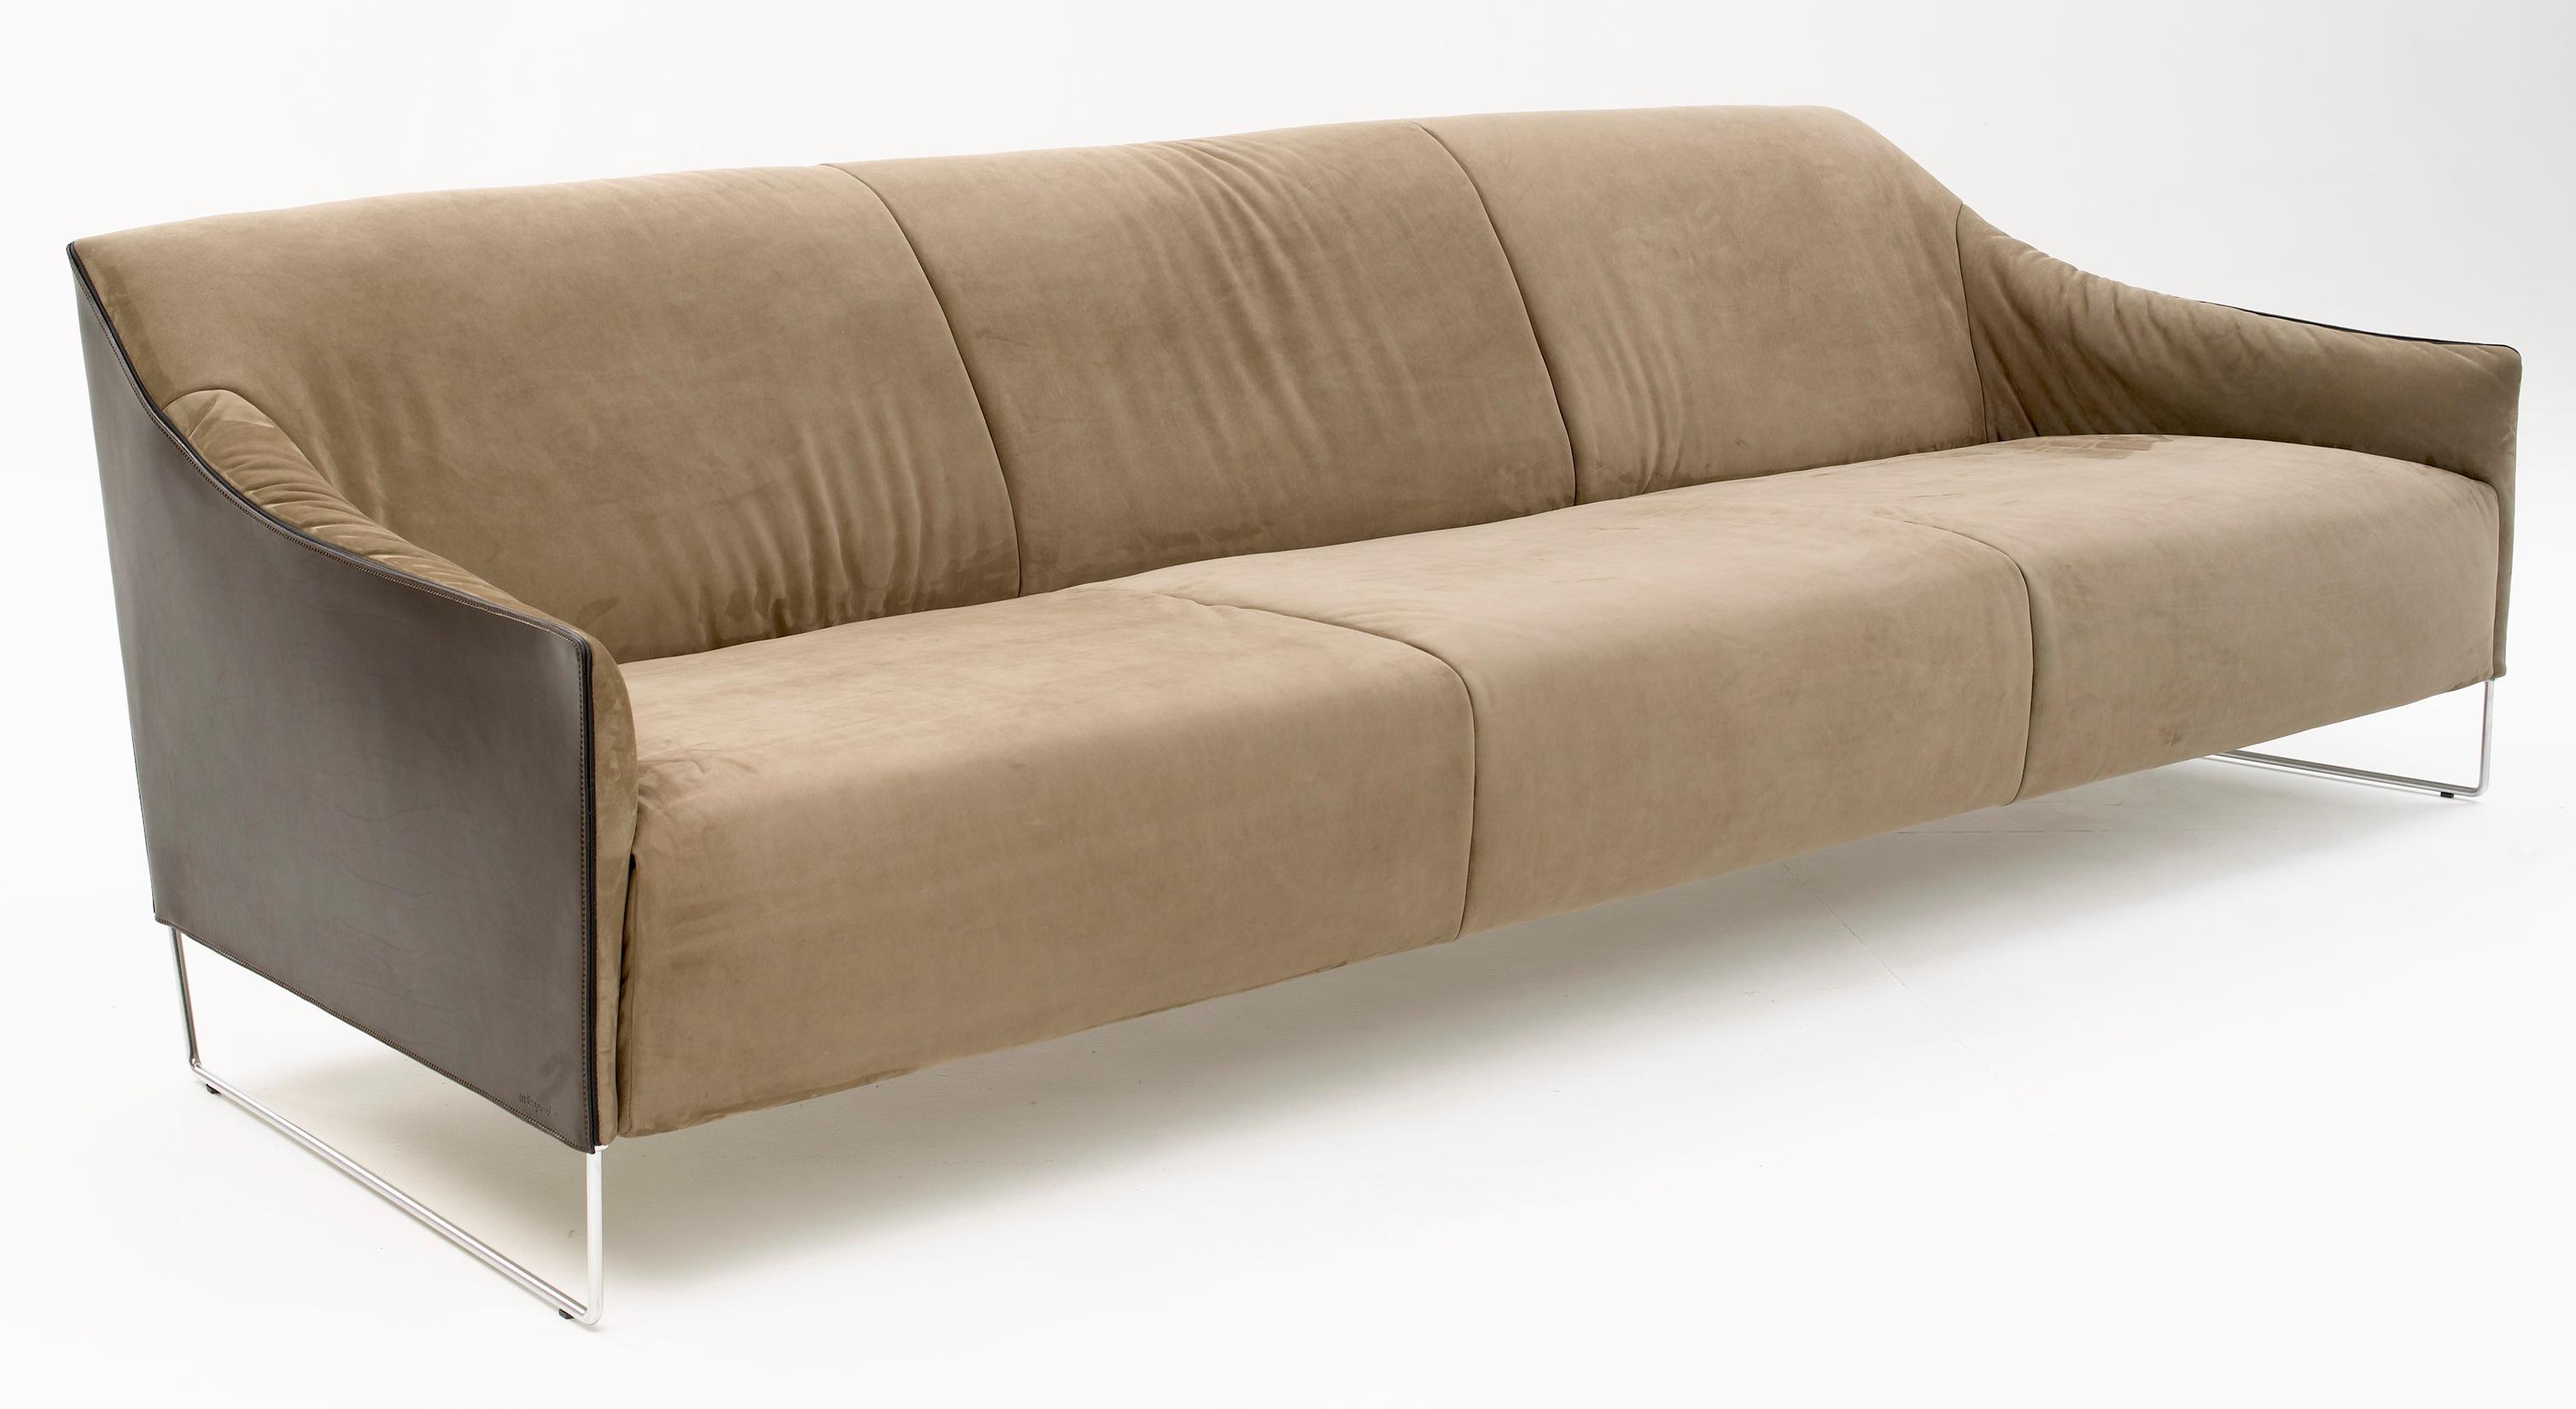 urban sofa gallery clayton dfs living interiors opens combi showroom and studio